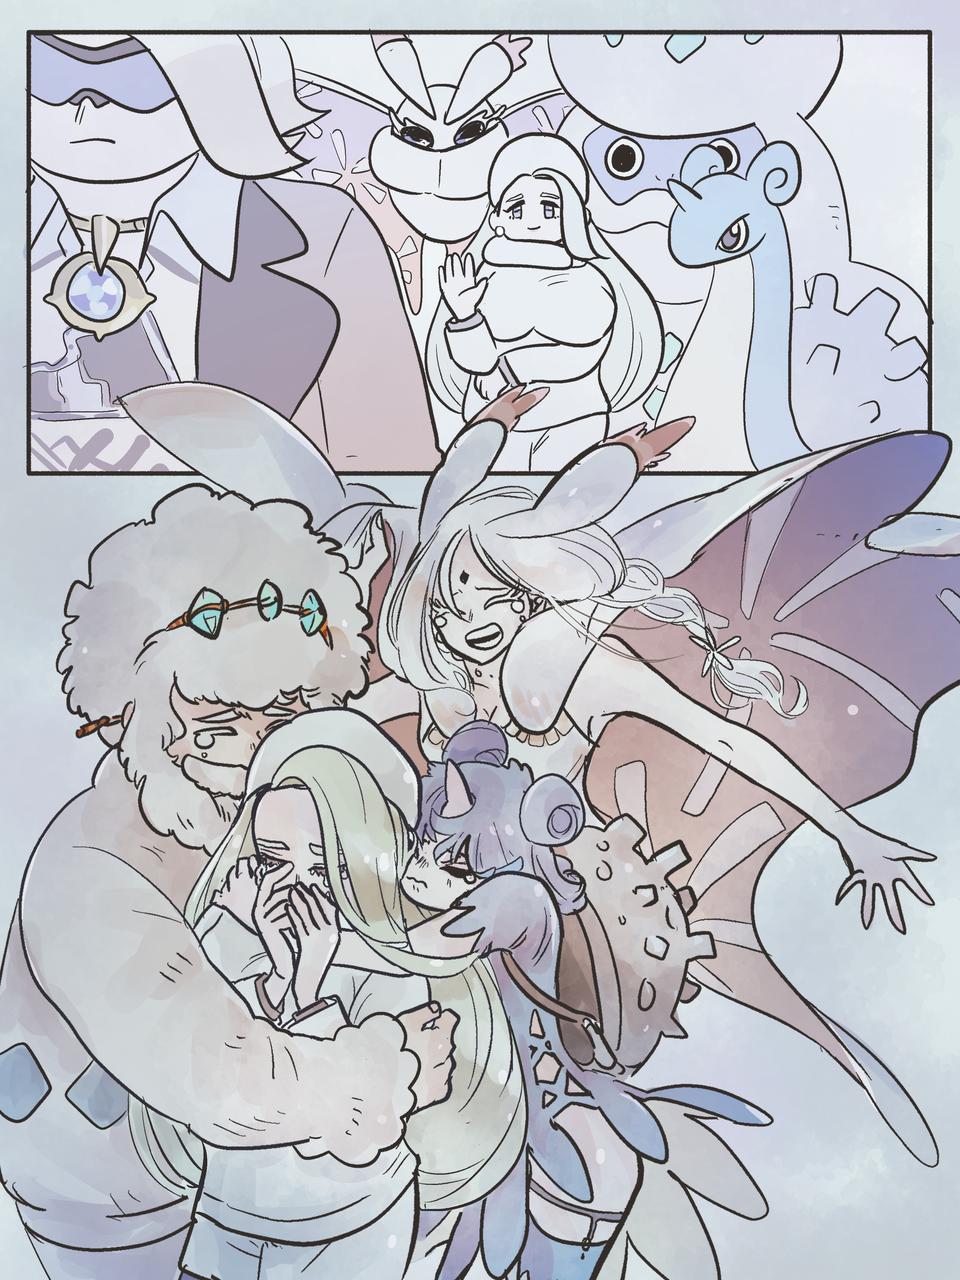 Illust of 塩ながす medibangpaint PokémonSwordandShield メロン(ポケモン) pokemon-gijinka